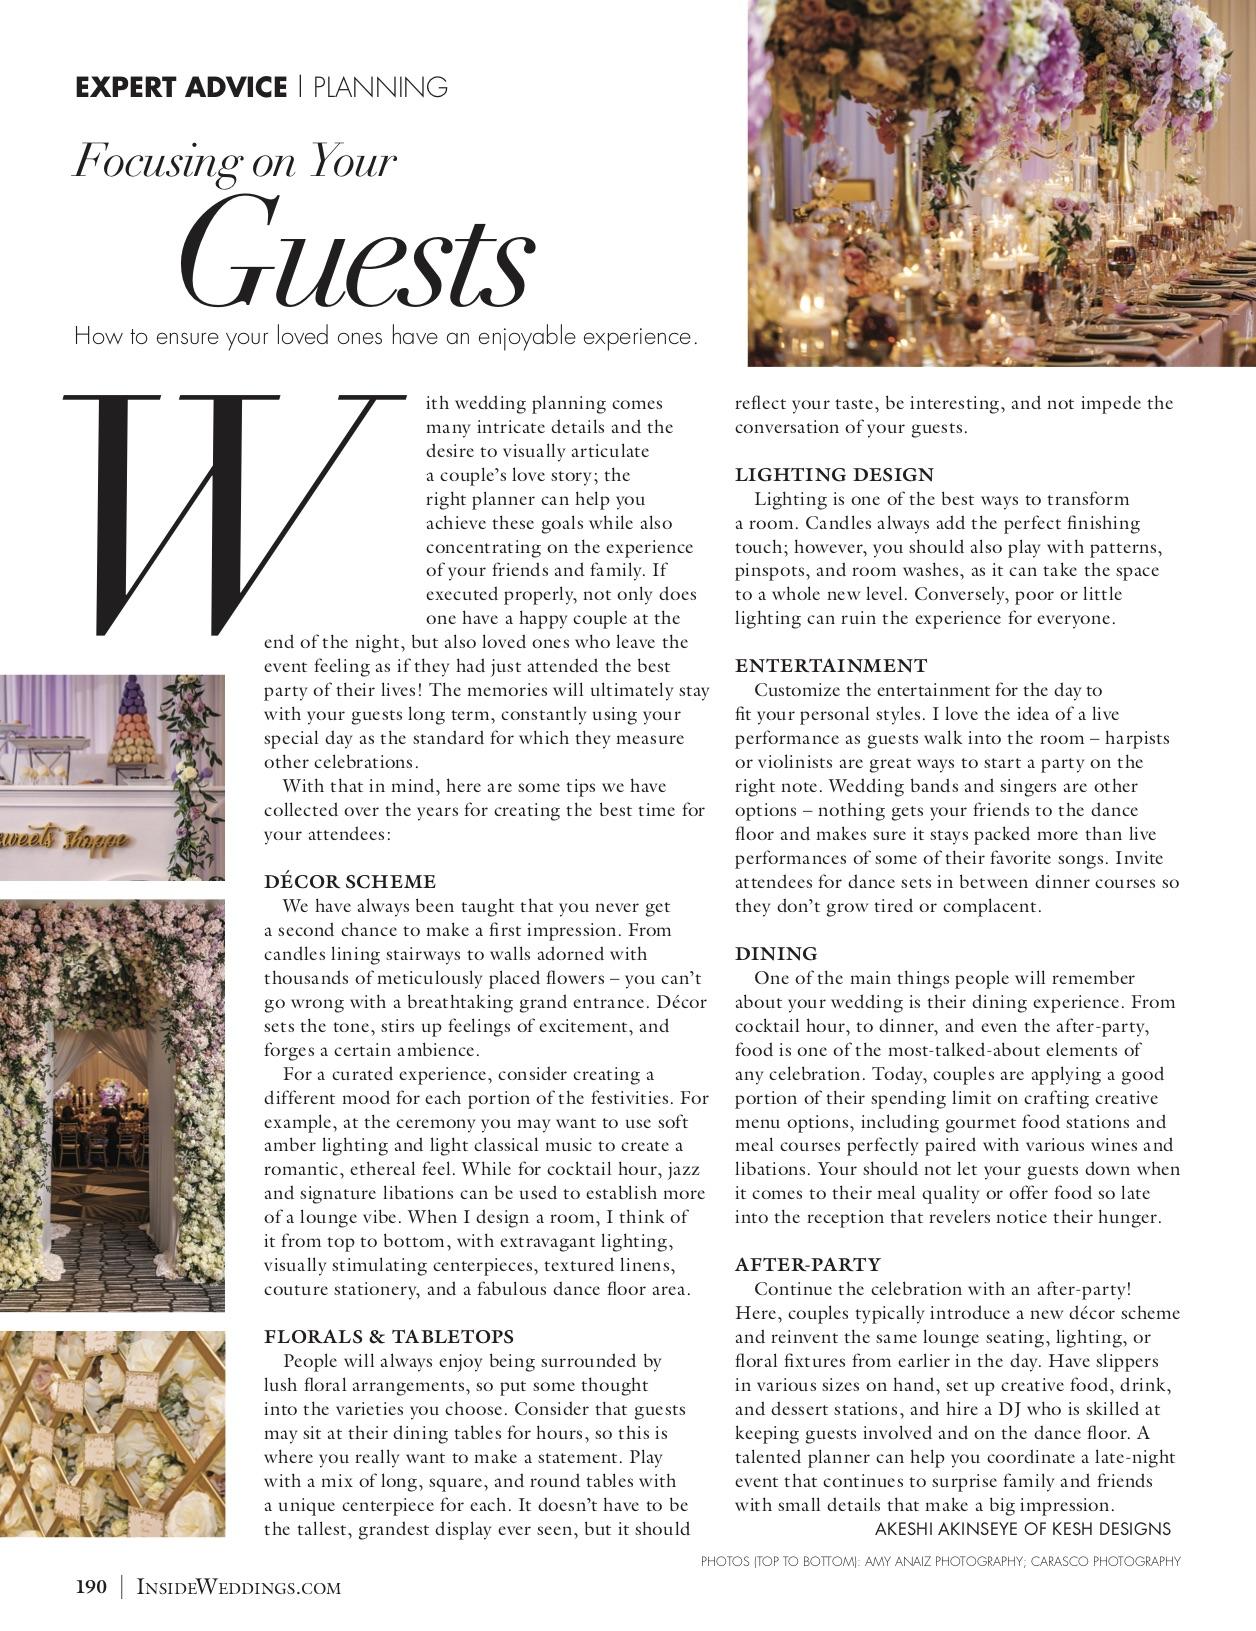 Expert-advice-Article-inside-weddings-kesh-events.jpg